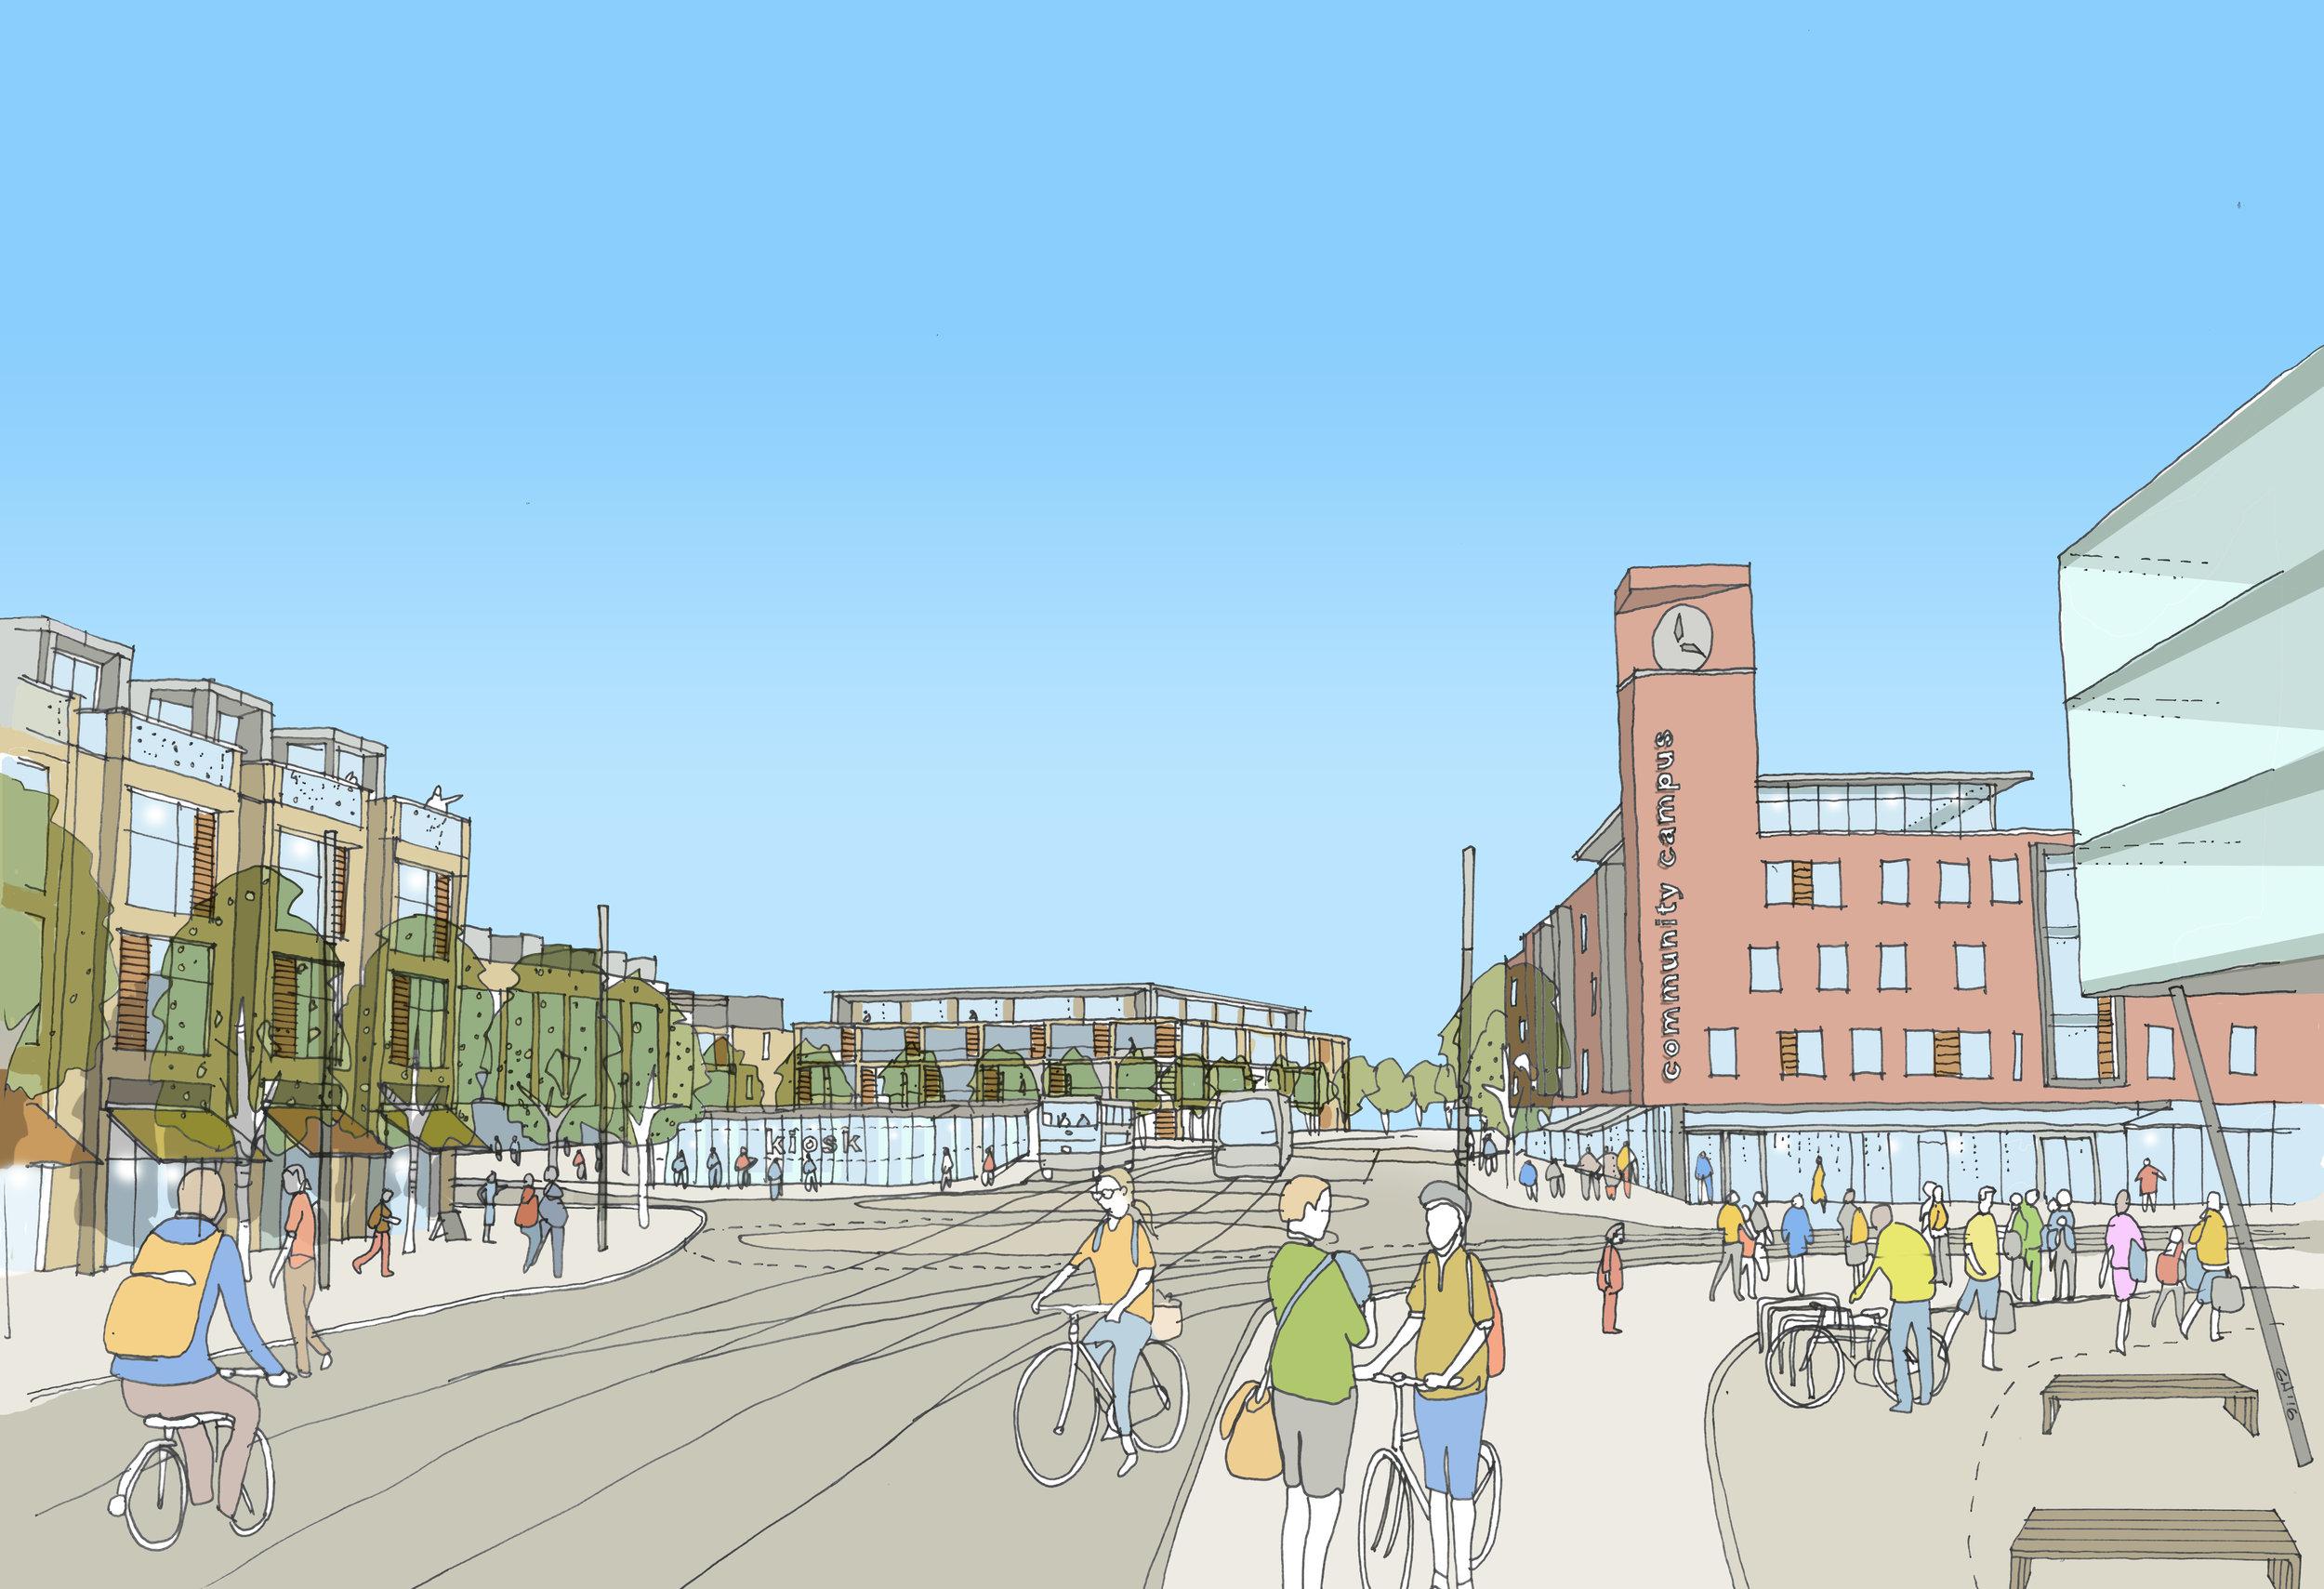 Plasdŵr District Centre - Artist's Impression